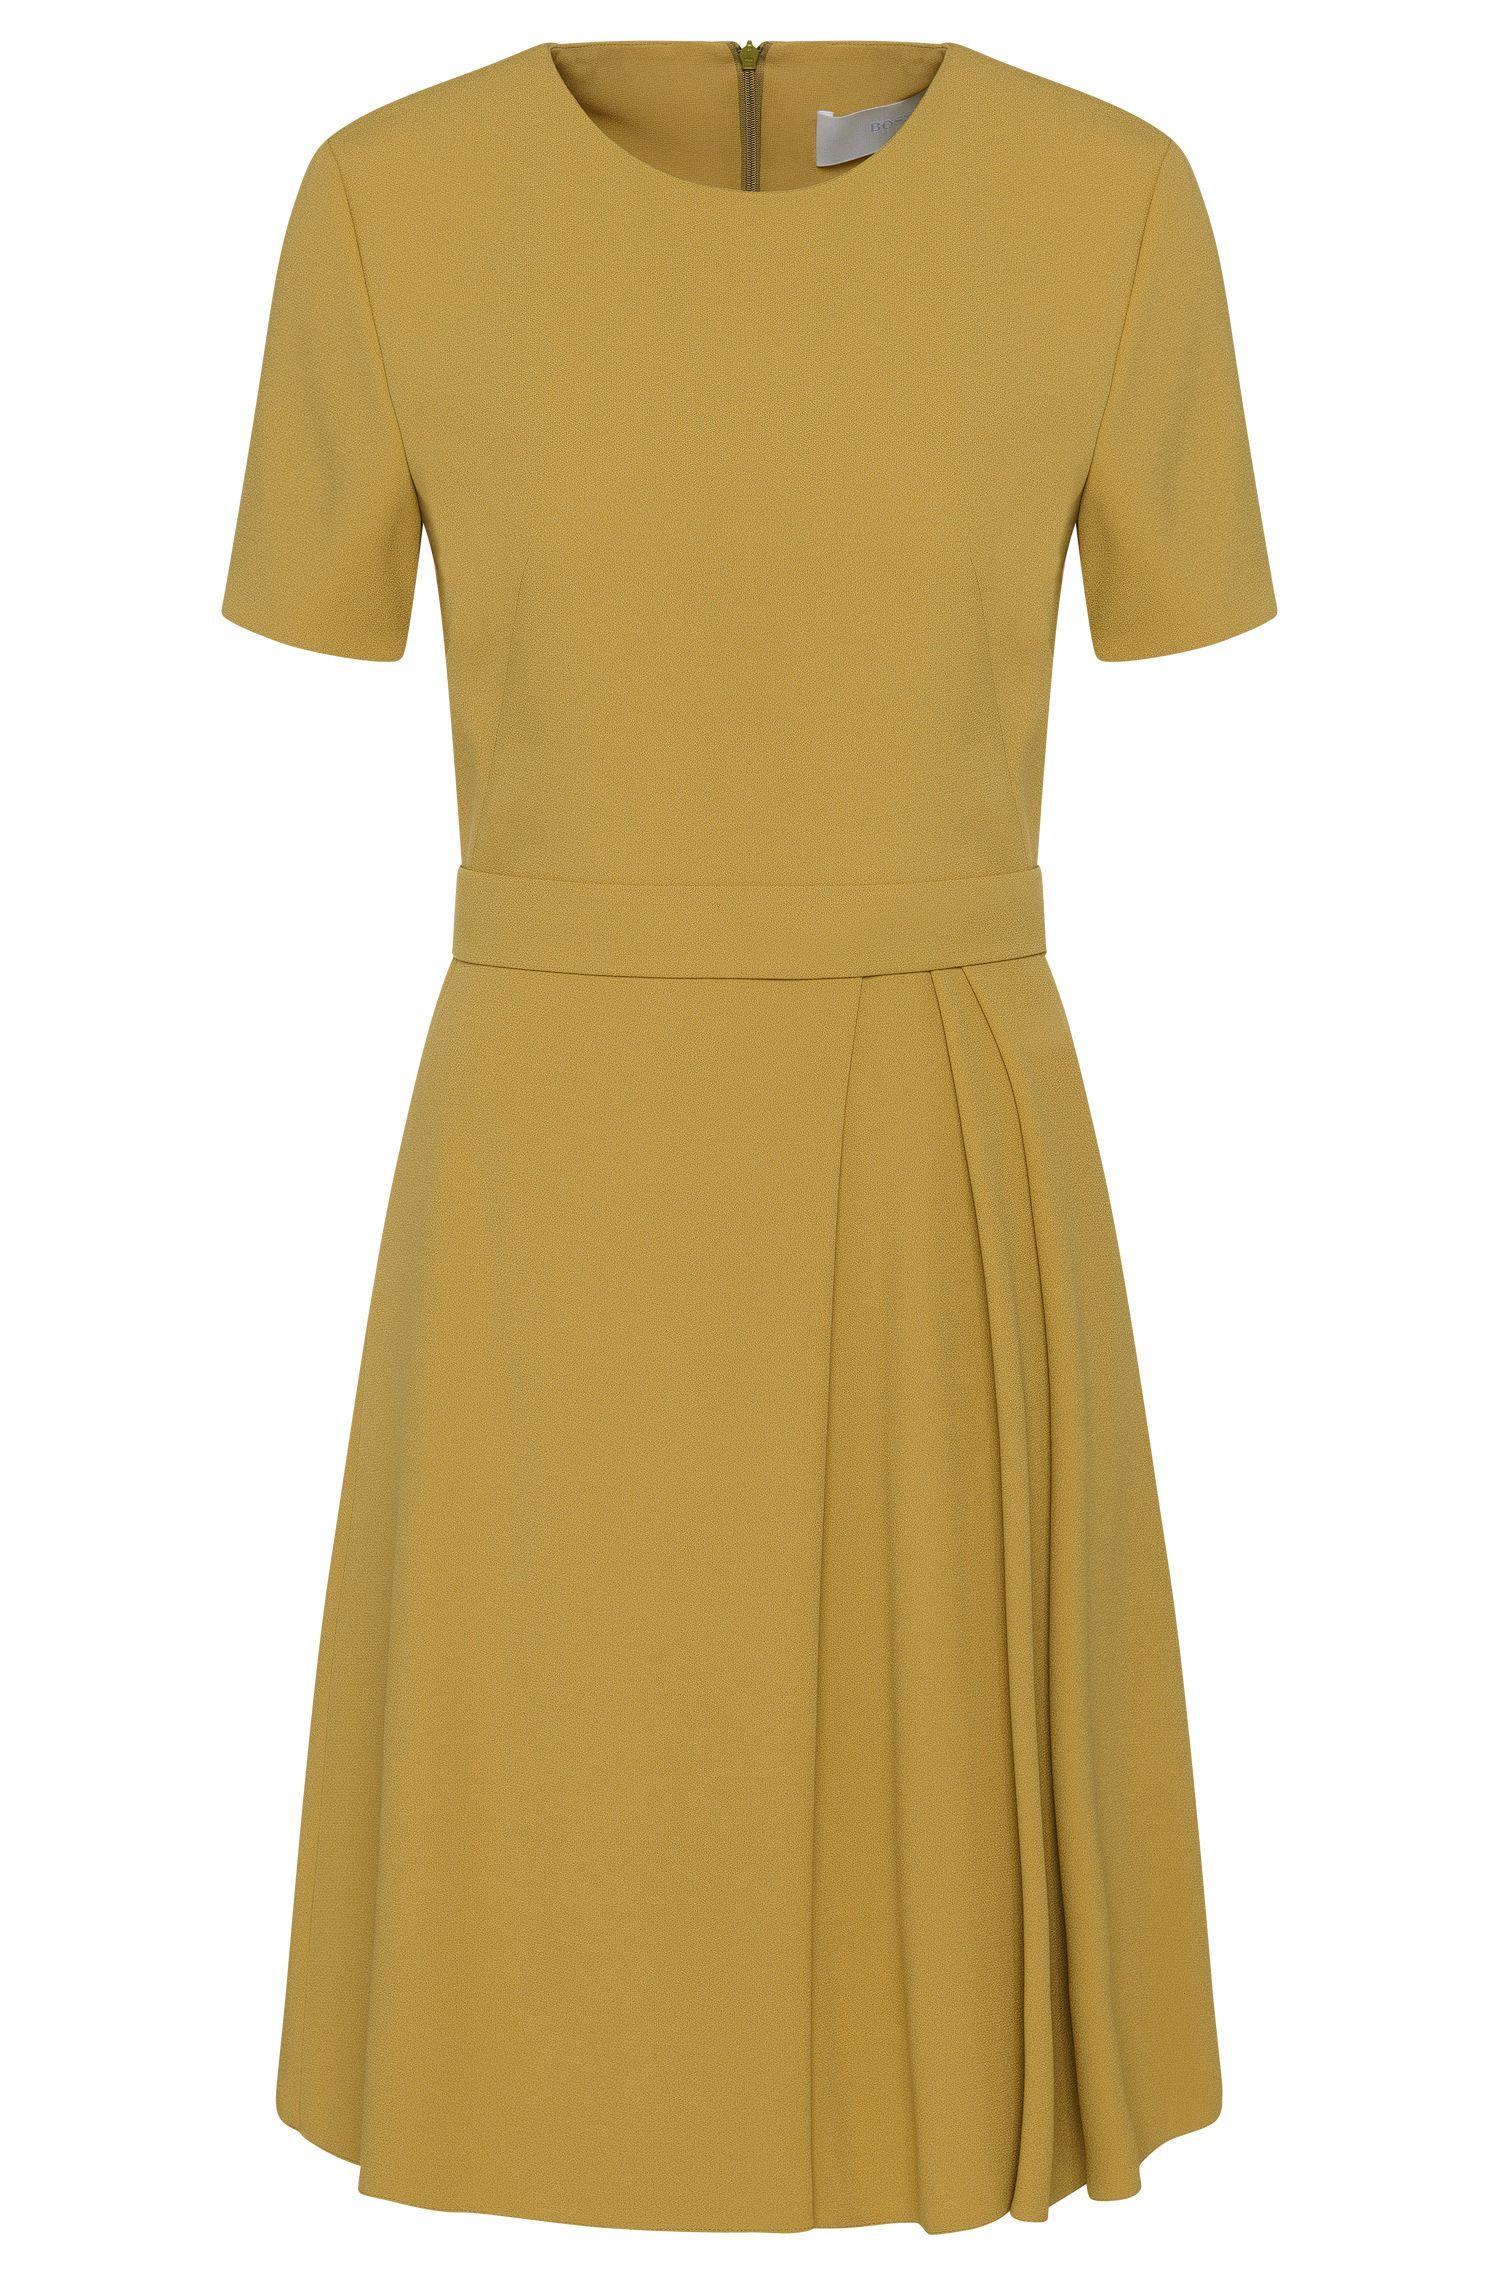 'Dalinkana' | Crepe A-Line Pleated Dress